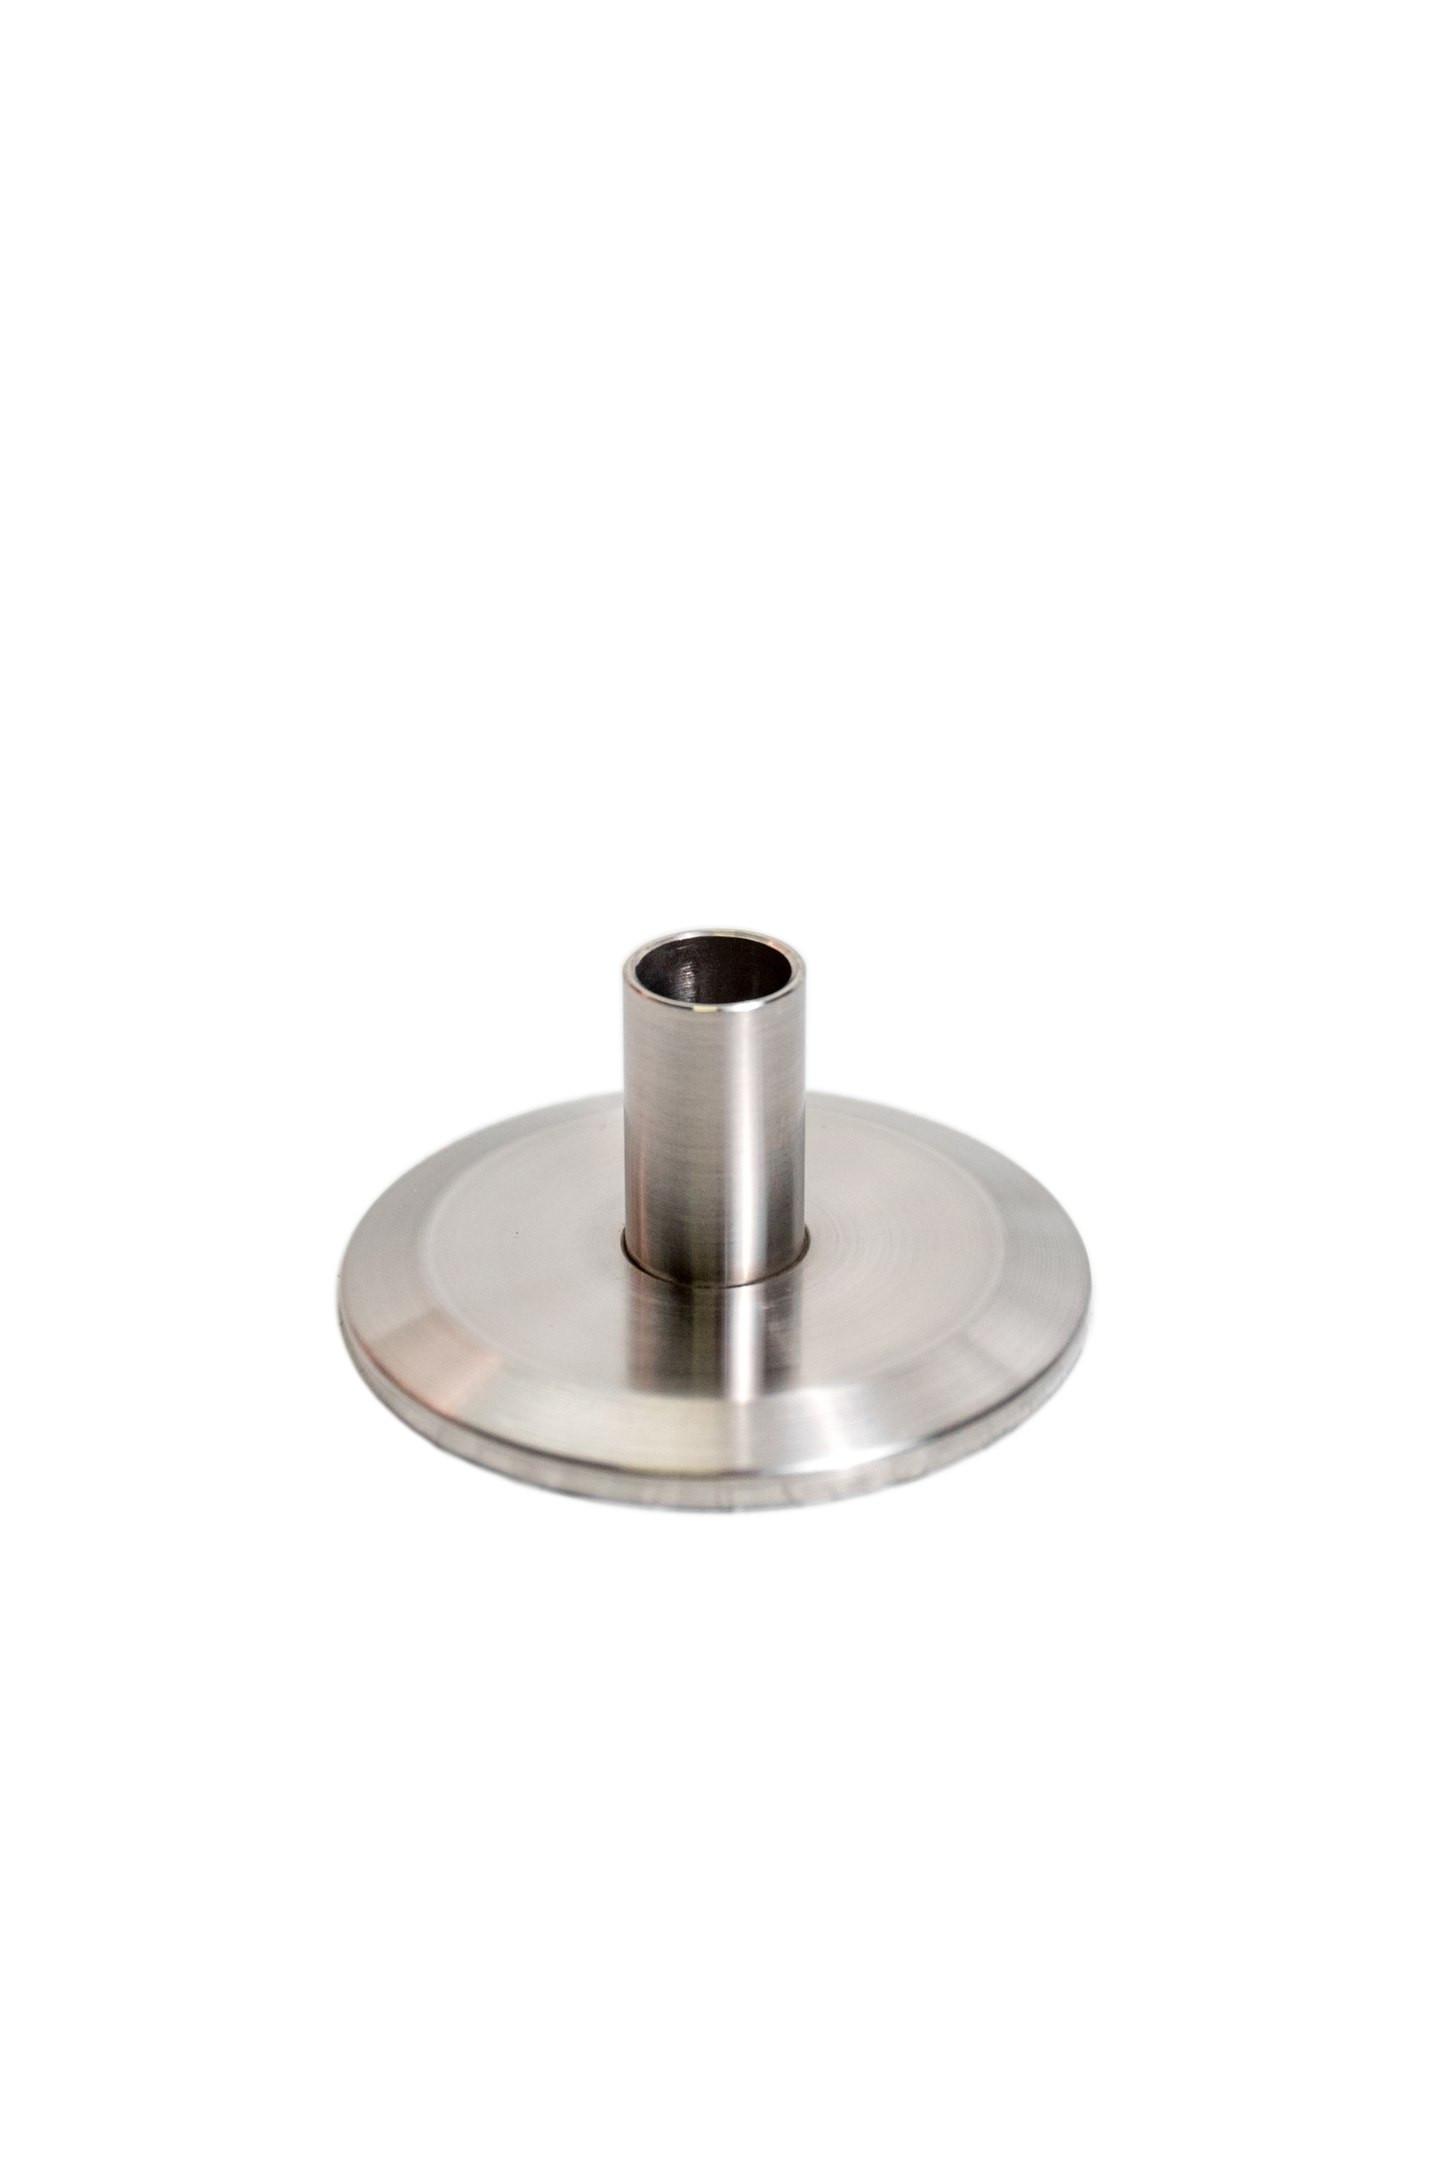 "Steel surge breaker (Tri-Clamp 1.5"")"